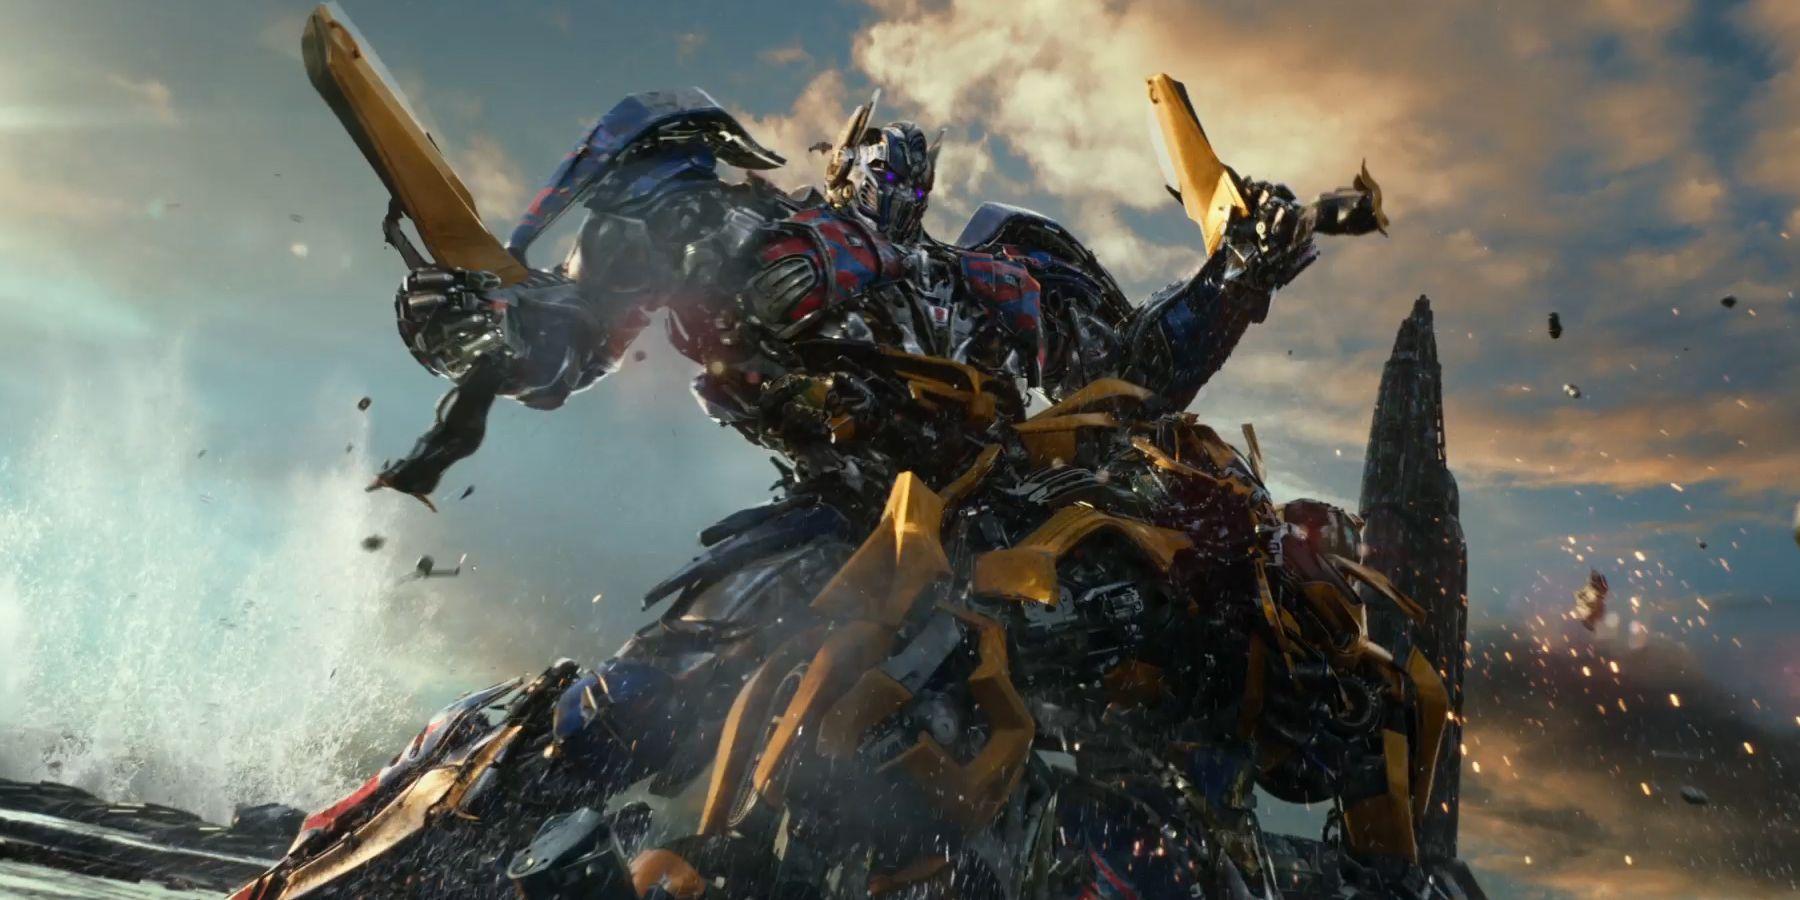 Transformers-The-Last-Knight-Optimus-Bumblebee-fight.jpg